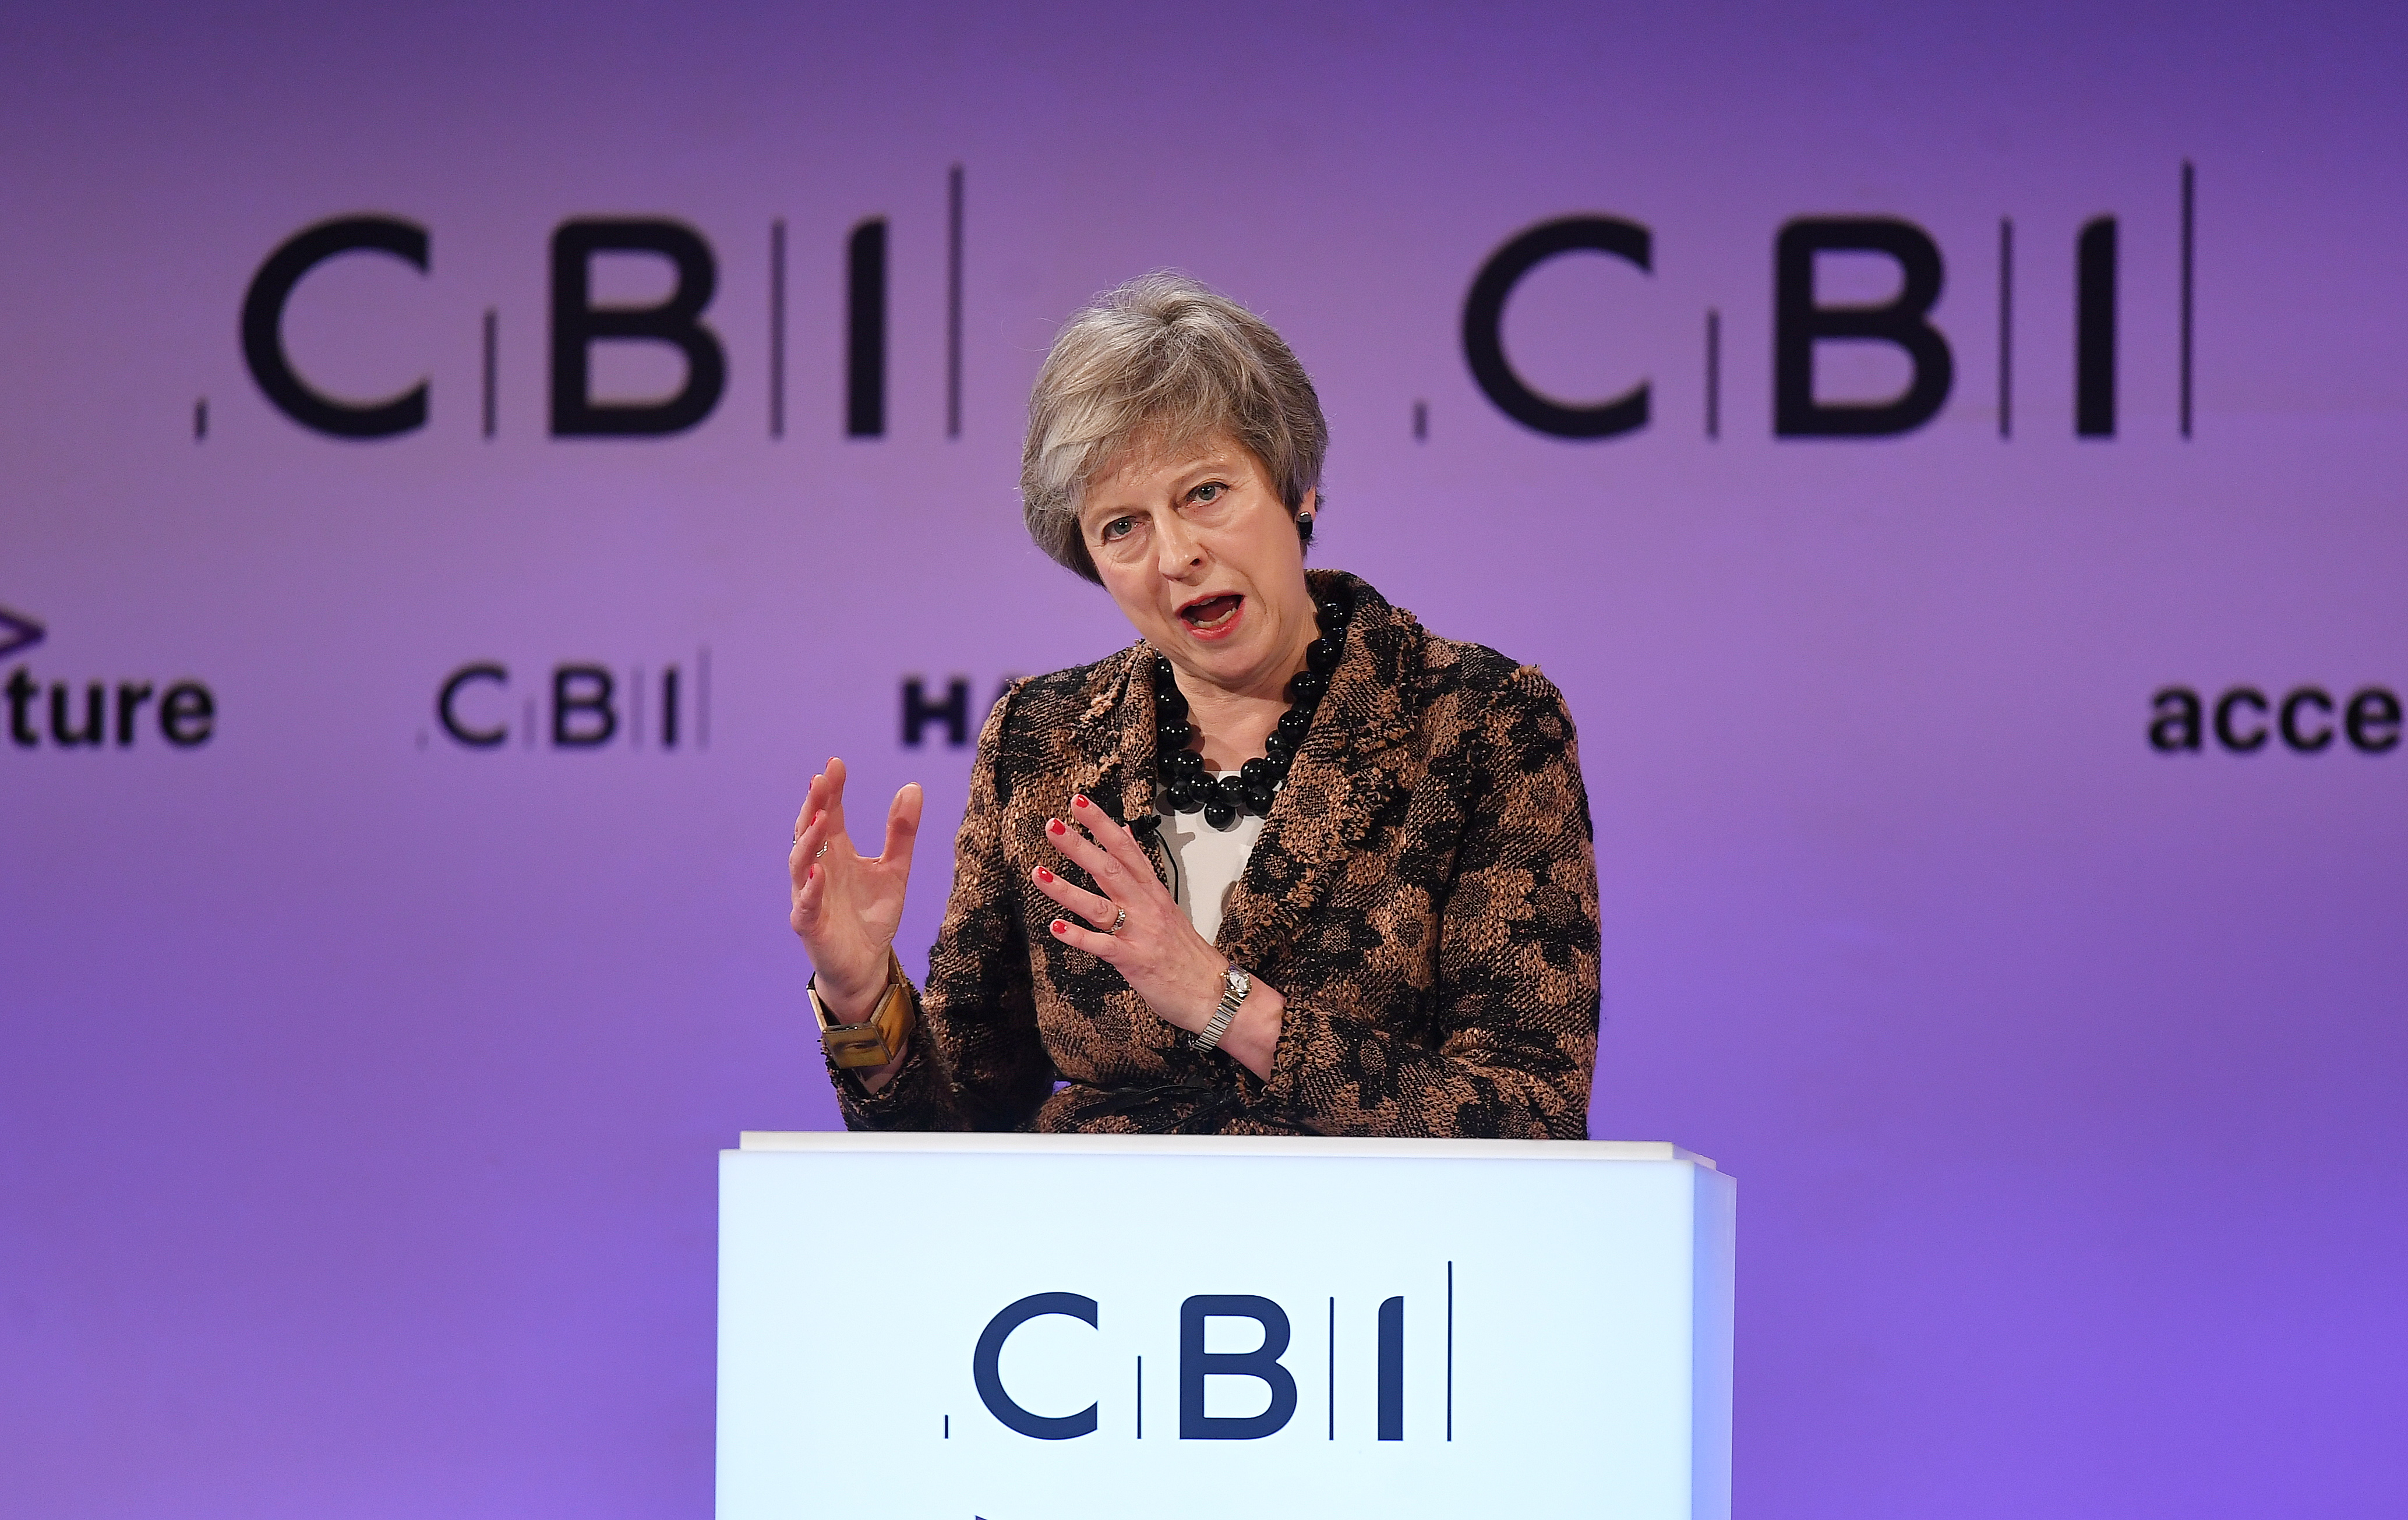 Poslodavci podupiru dogovor Therese May o Brexitu